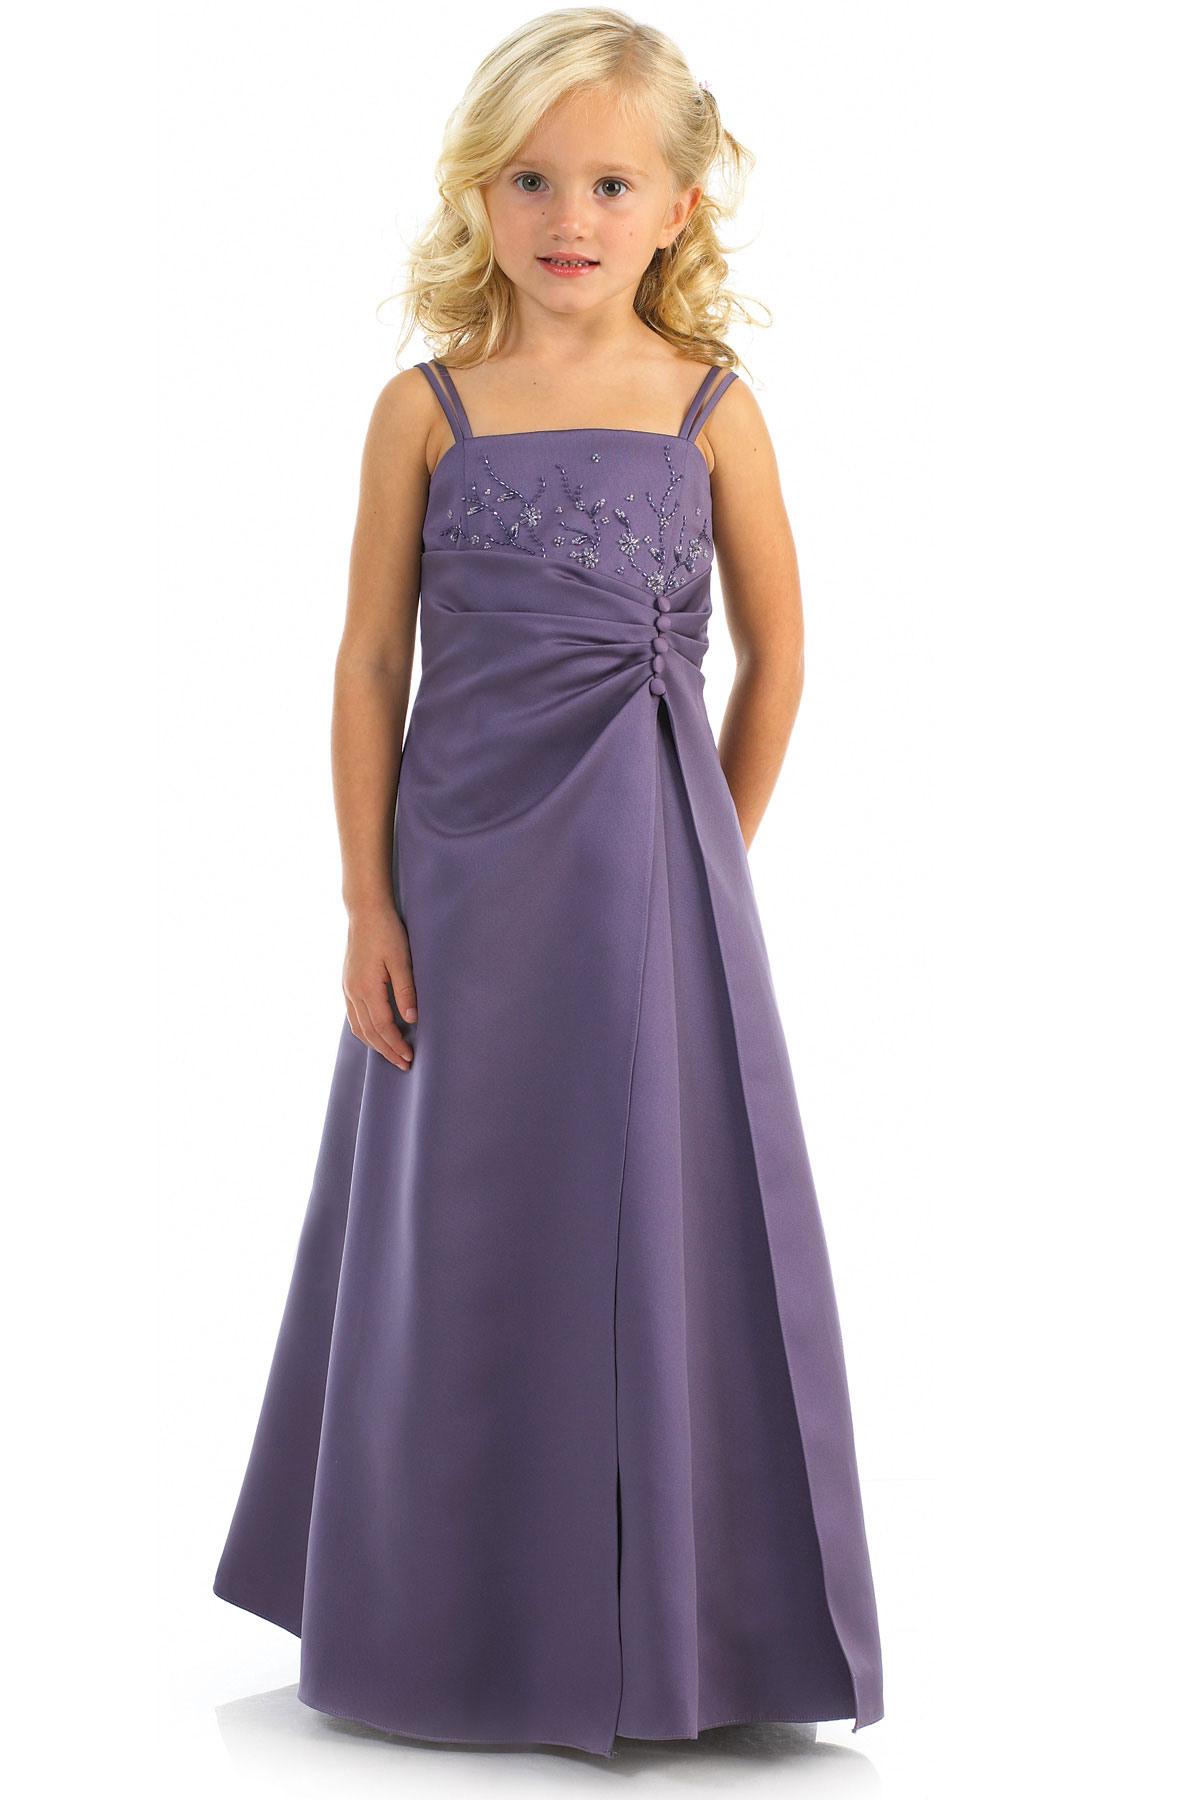 Jr Bridesmaid Dresses  High Fashion Update